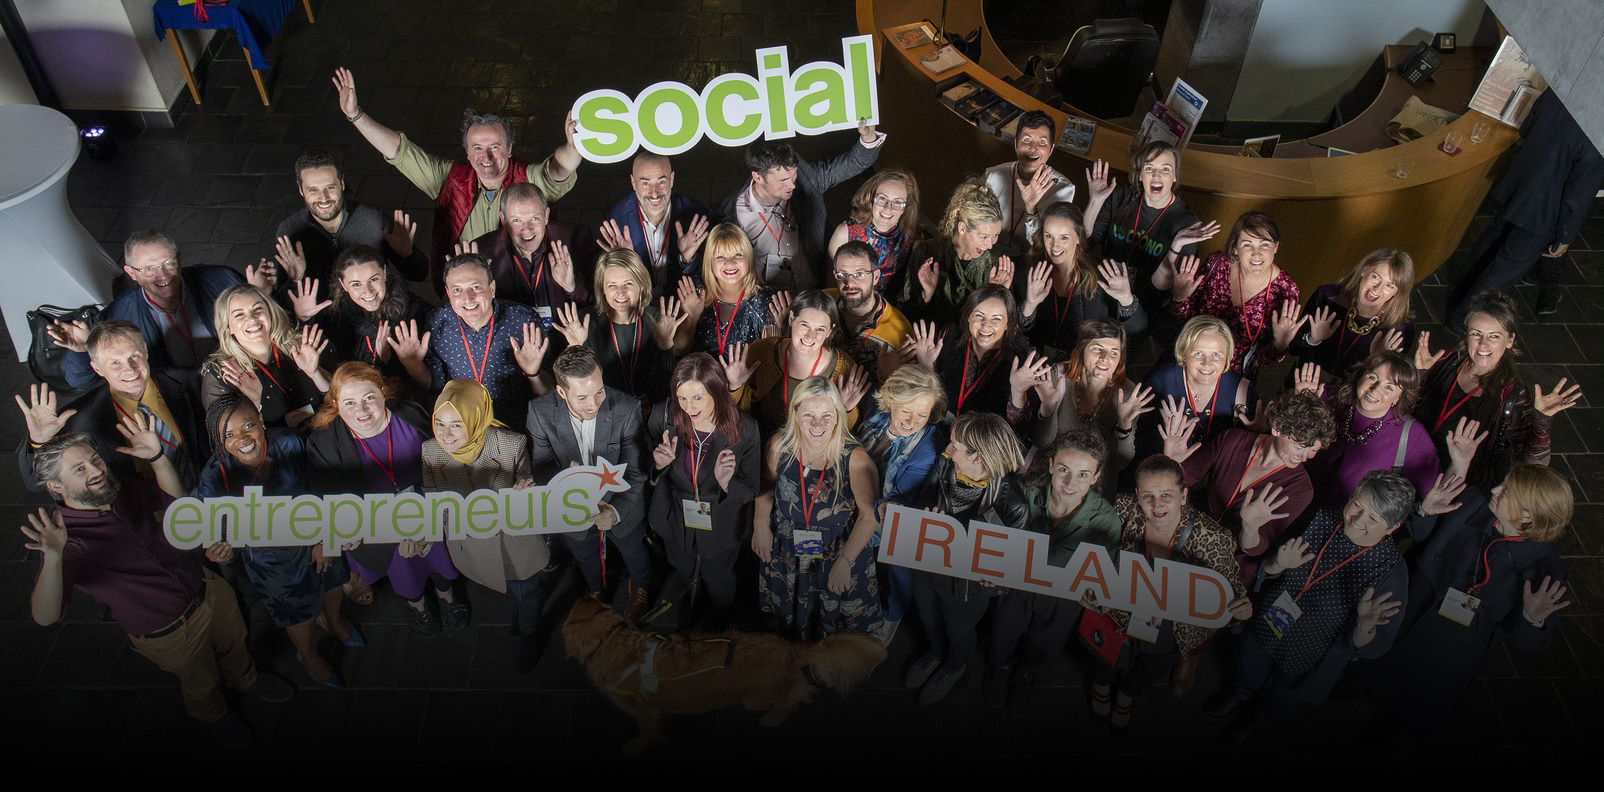 Social Entrepreneurs Ireland announces 40k seed fund for Ideas Academy programme